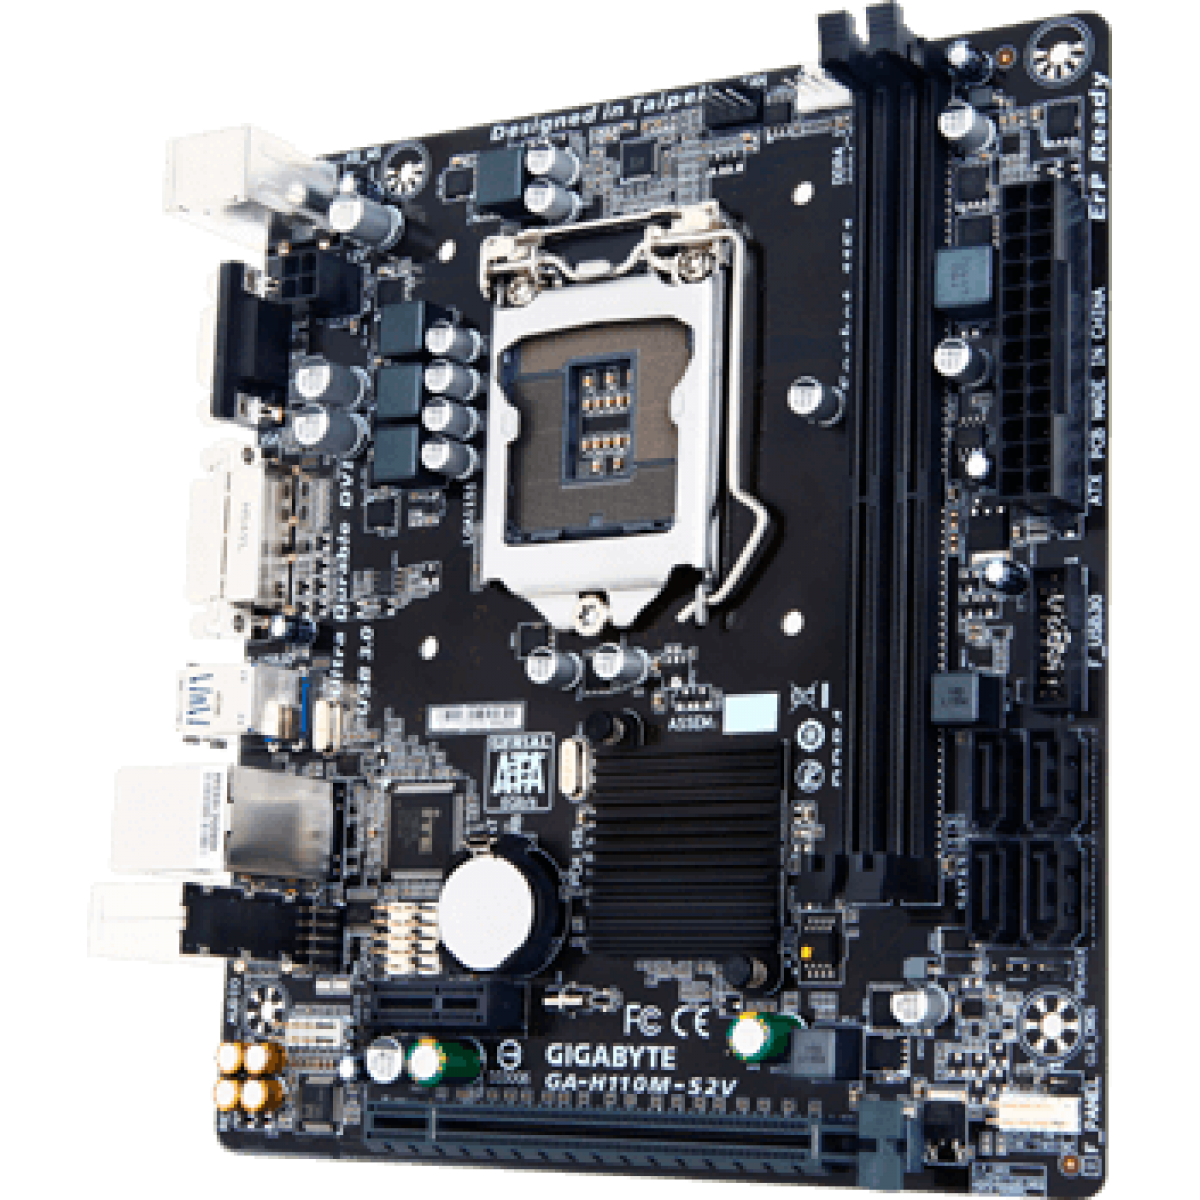 Placa Mãe Gigabyte GA-H110M-S2V, Chipset H110, Intel LGA 1151, mATX, DDR4